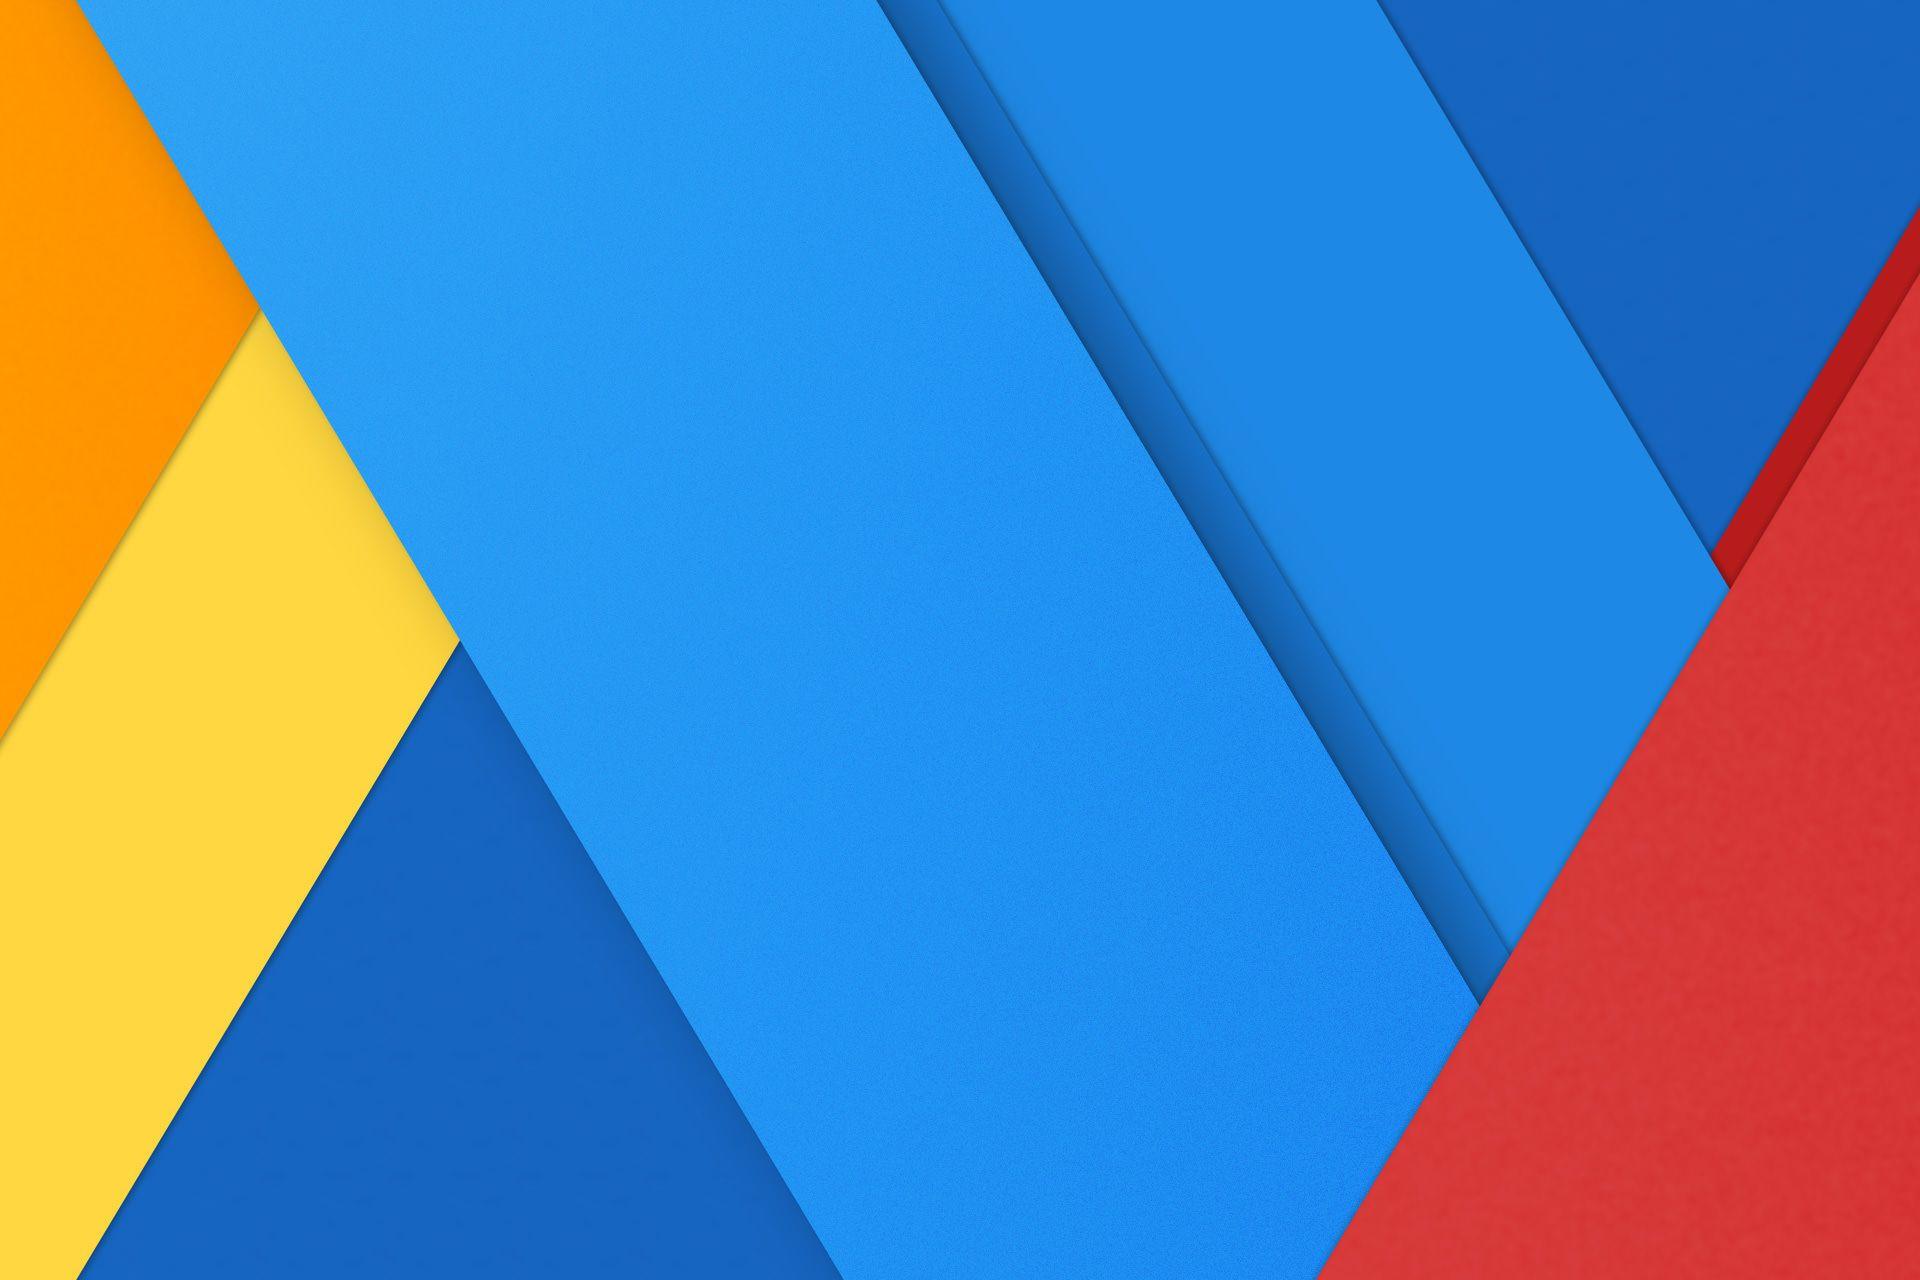 Download Stock Wallpapers Of Cyanogenmod 12s Stock Wallpaper 3d Wallpaper Abstract Background Hd Wallpaper